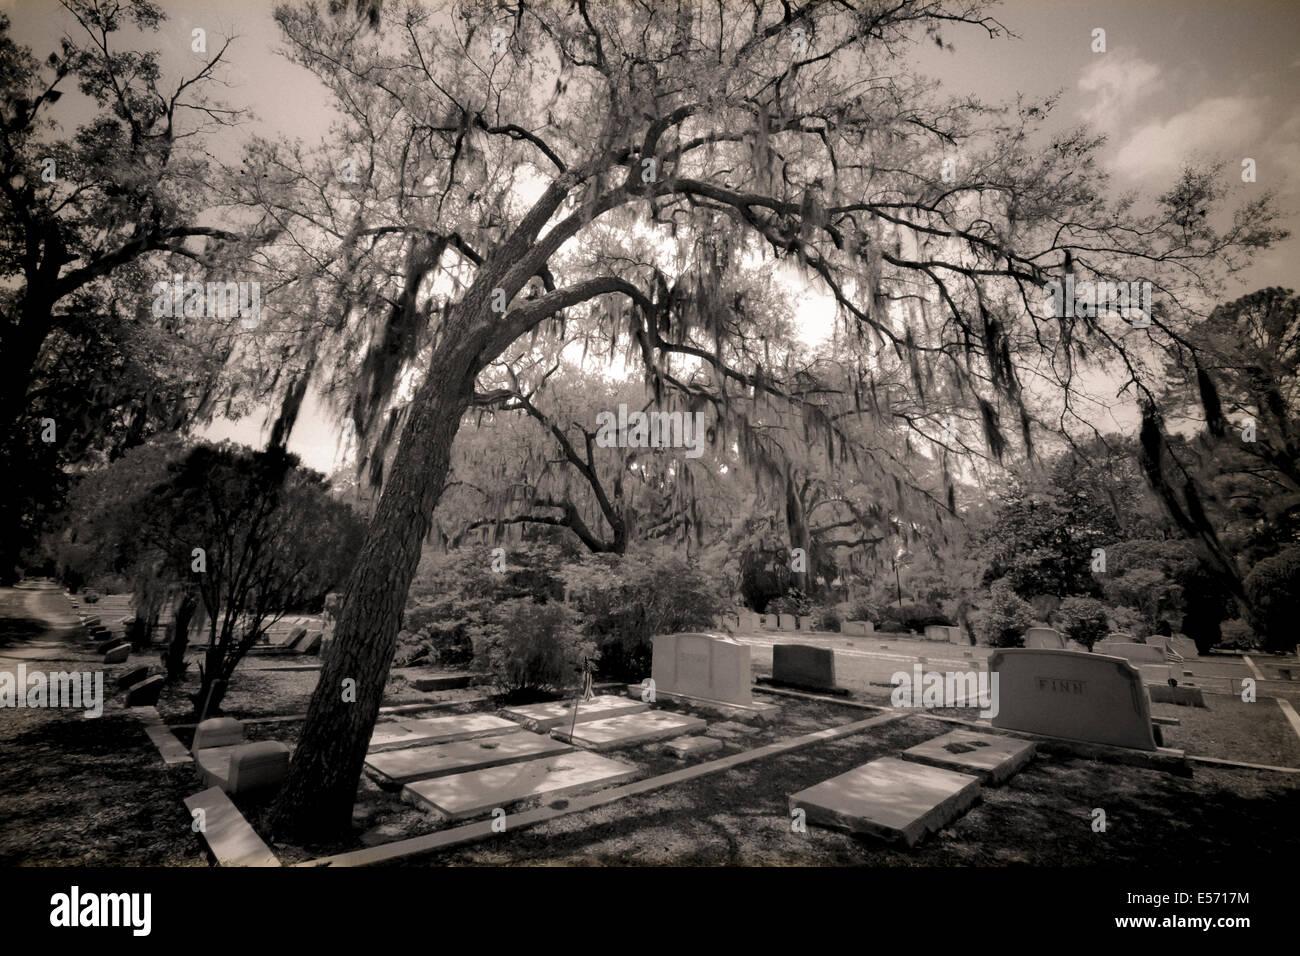 An impressive oak tree bends over the grasvesites in the legendary Bonventure Cemetery in Savannah, GA, USA - Stock Image